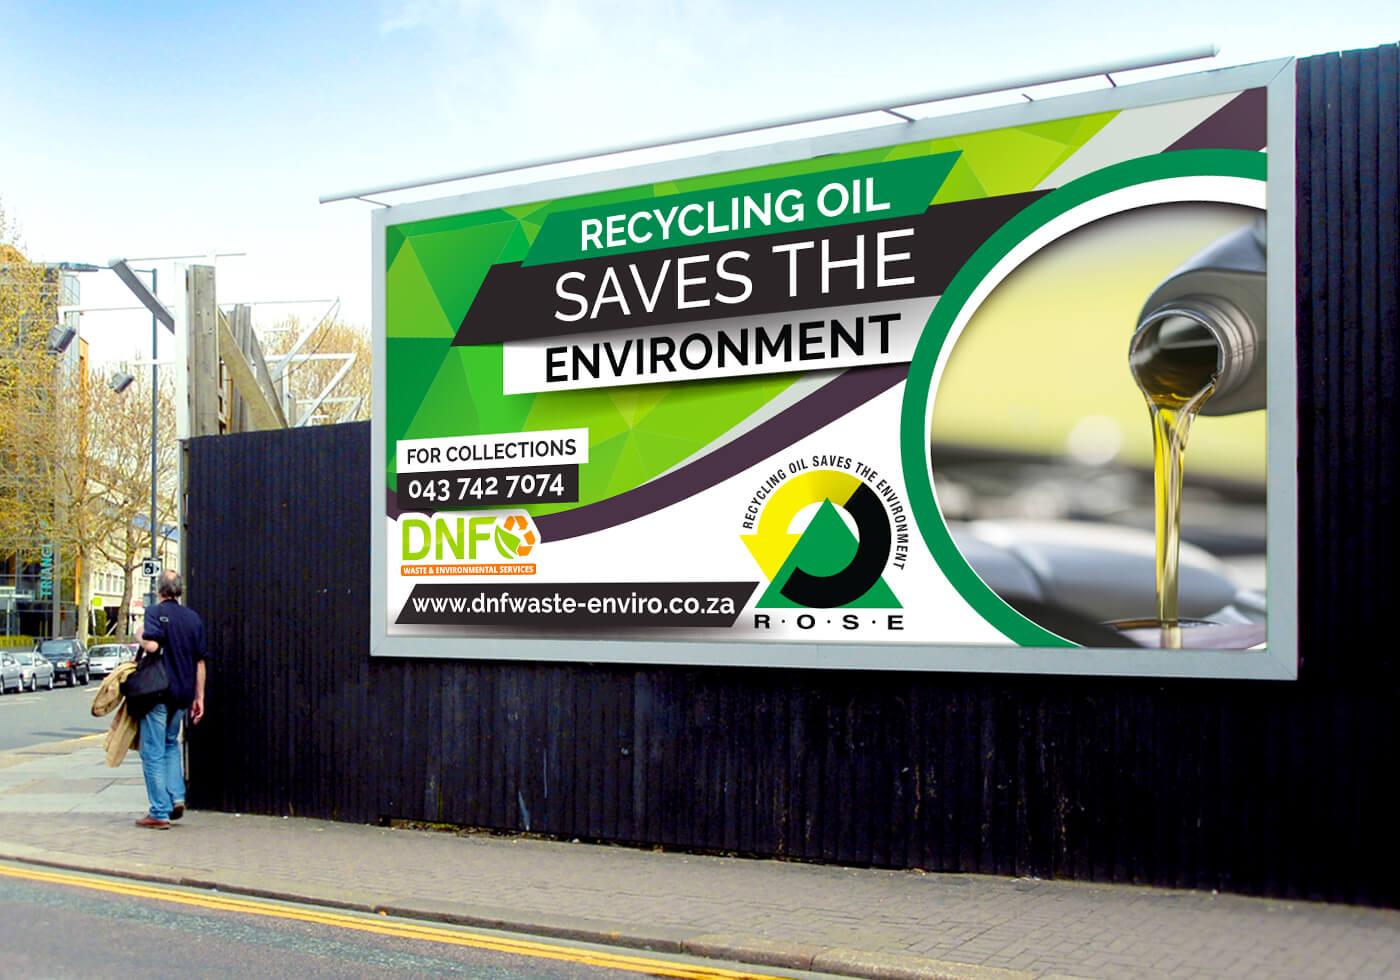 Advertising East London